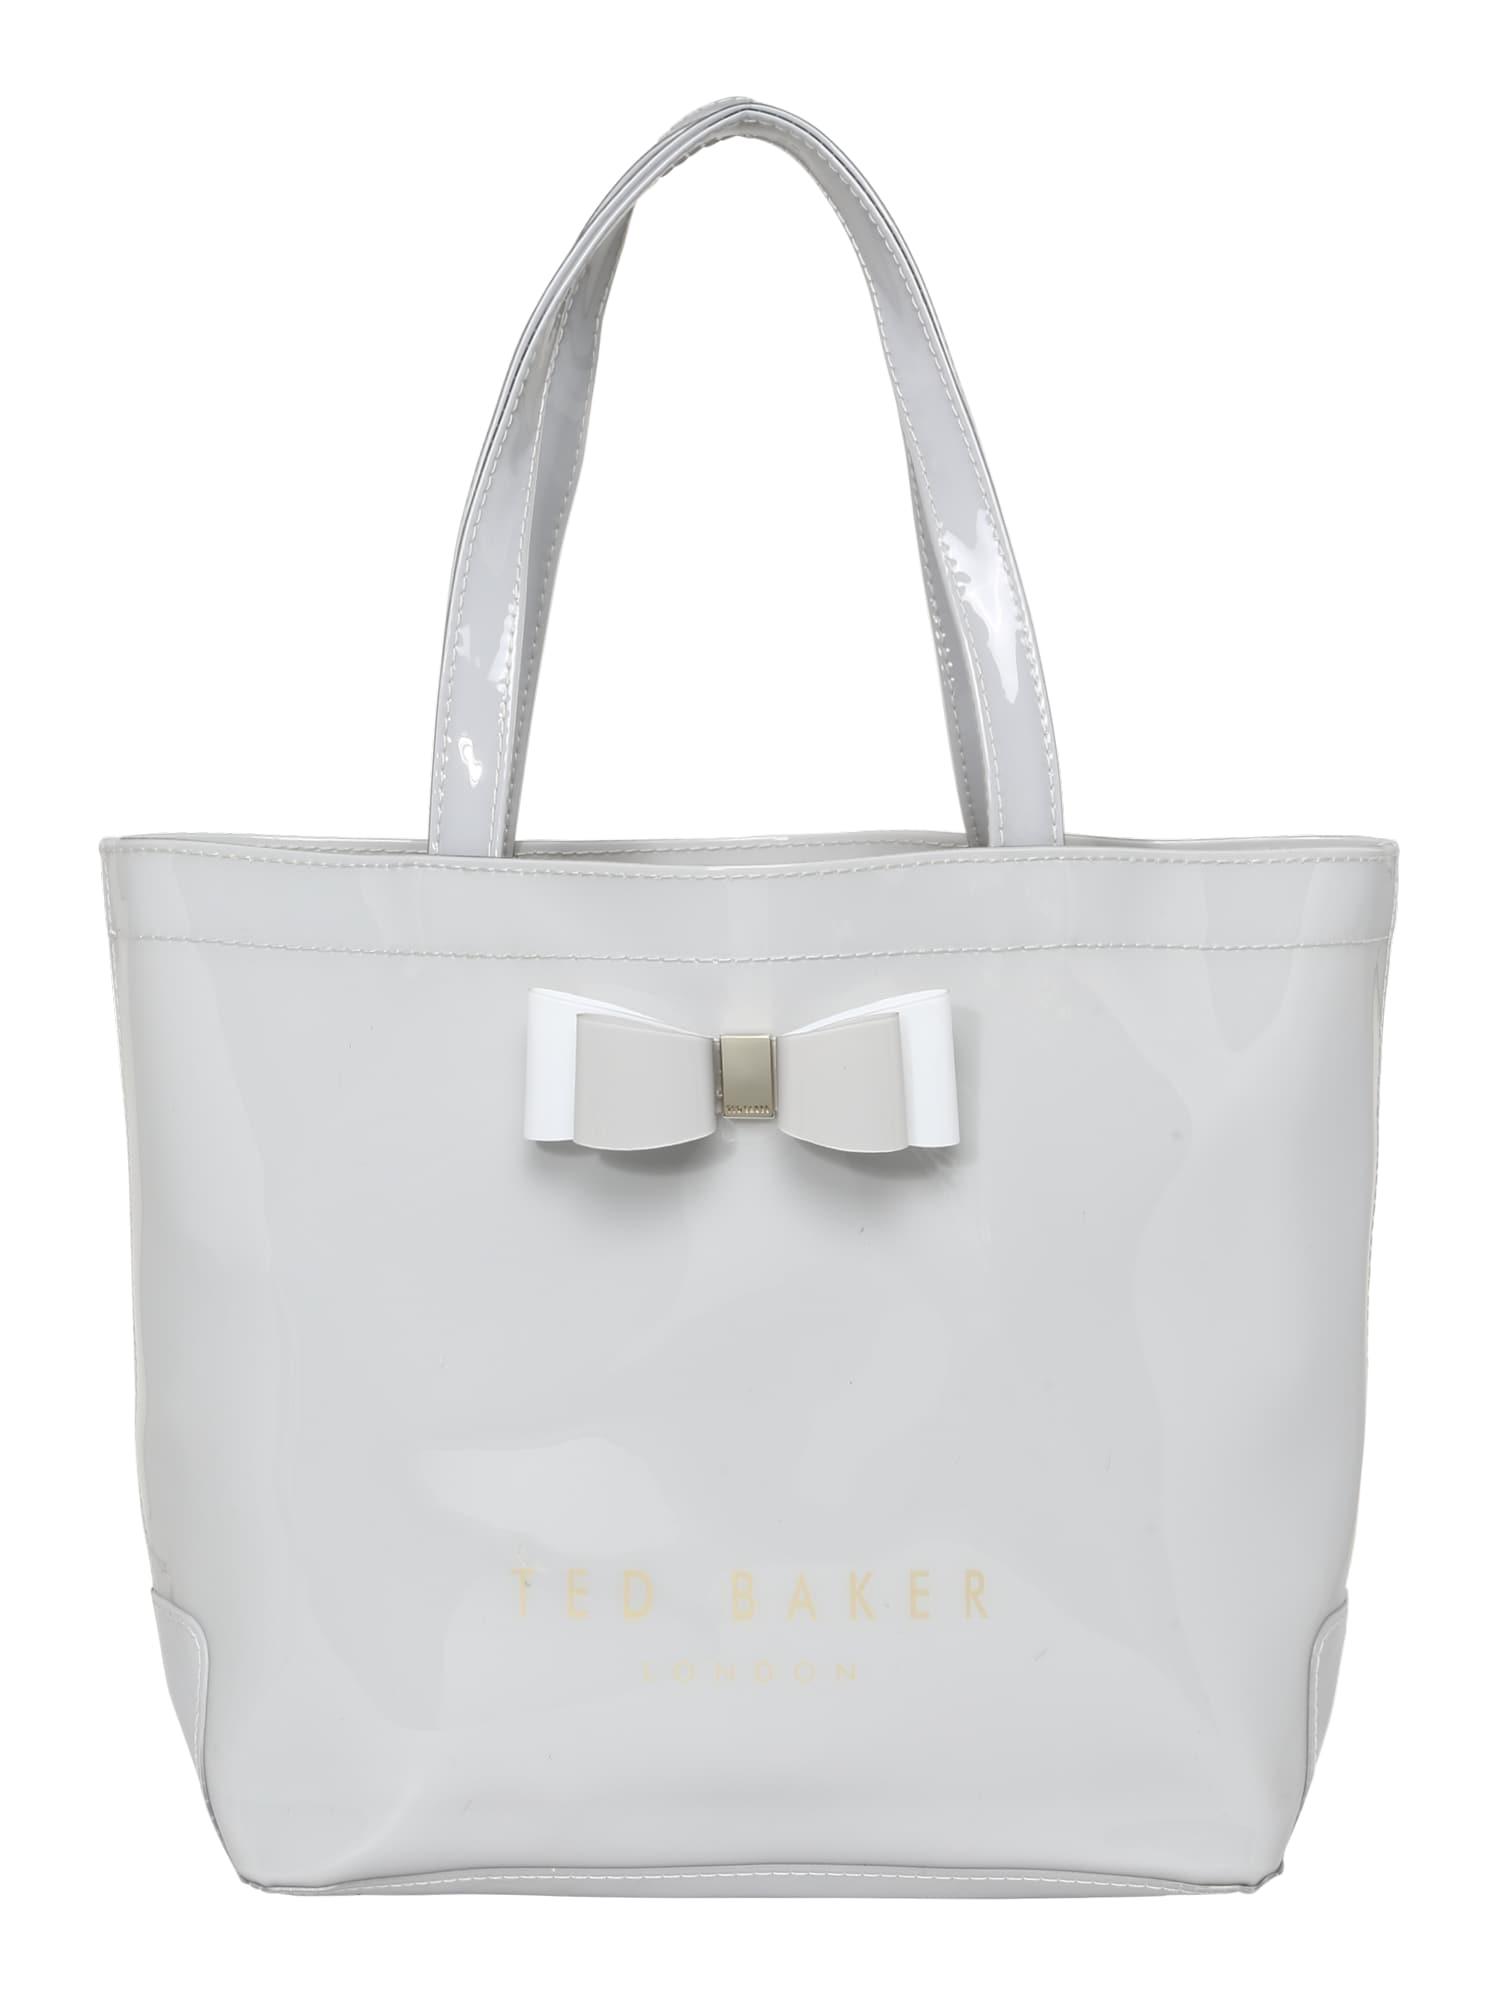 Ted Baker Pirkinių krepšys pilka / balta